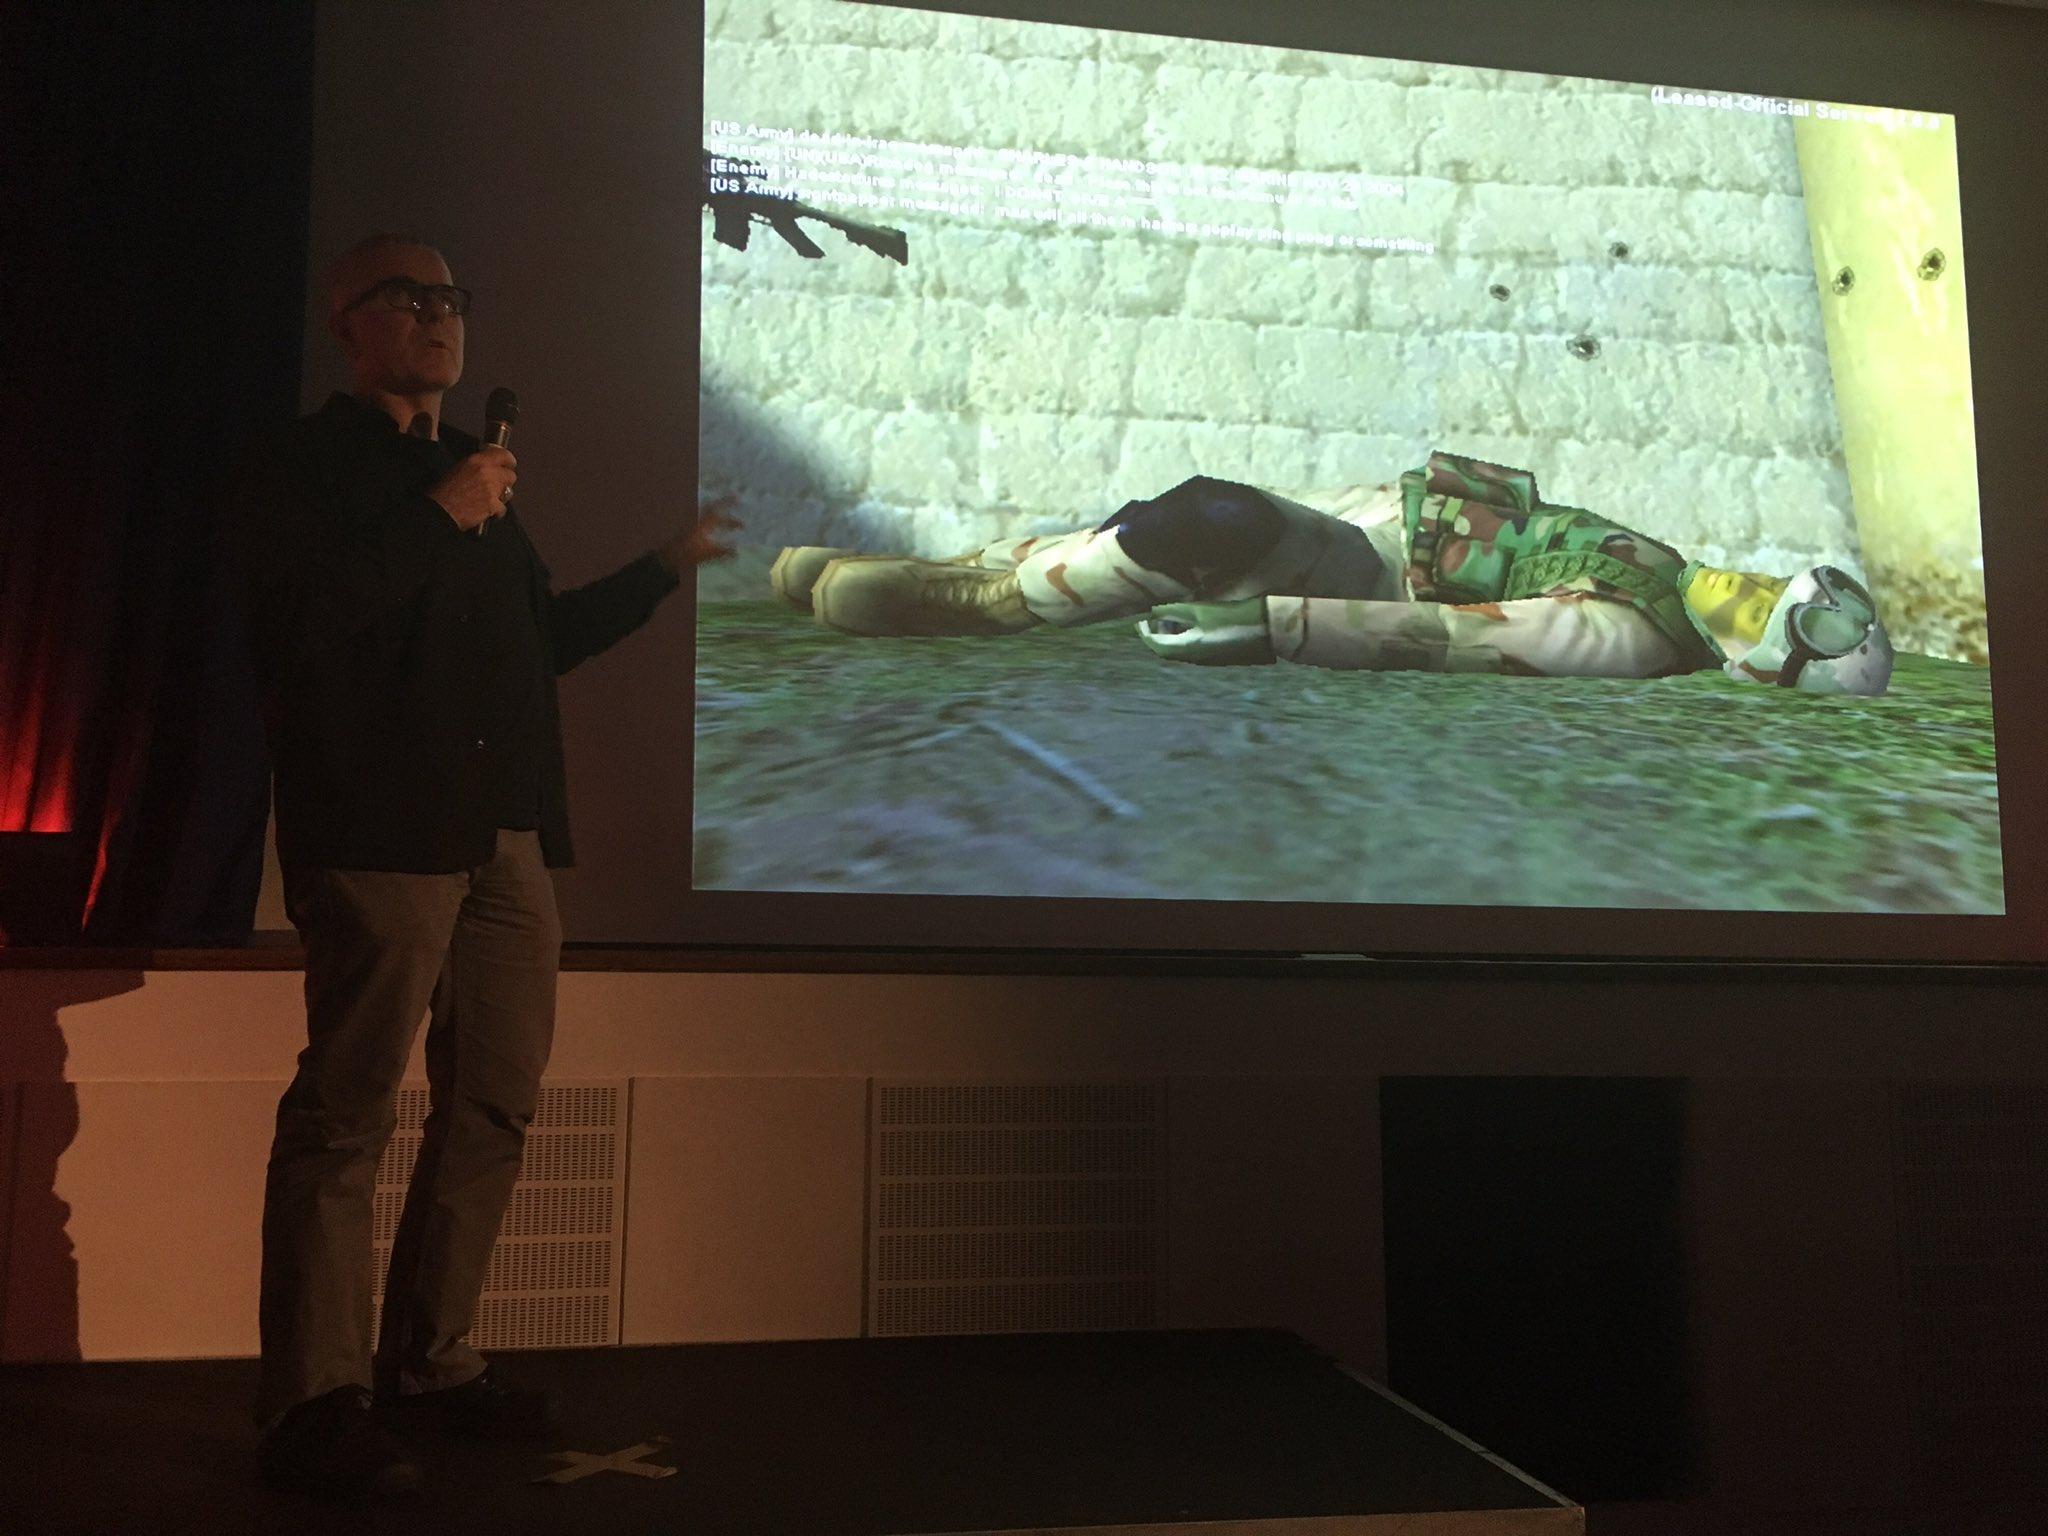 Here at #GamesPK @josephdelappe Professor of Games and Tactical Media, Abertay University talks his journey/responses as artist + activist. https://t.co/RyWJDnPb7w